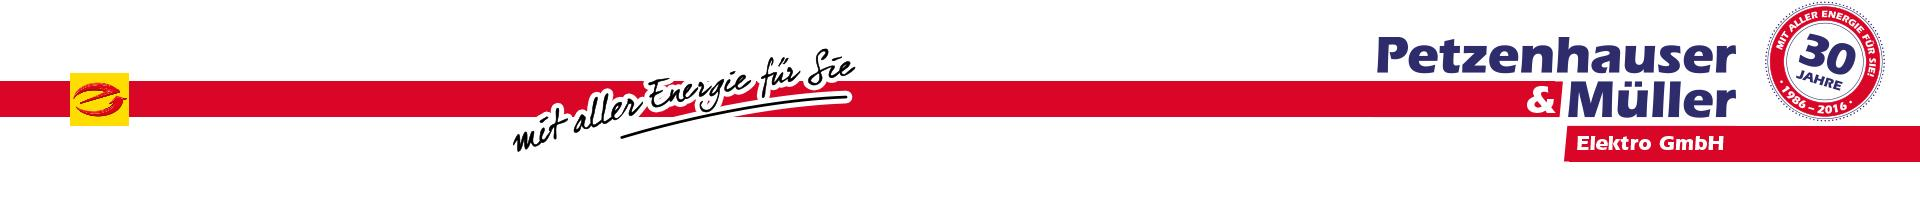 Petzenhauser & Müller Elektro GmbH Logo